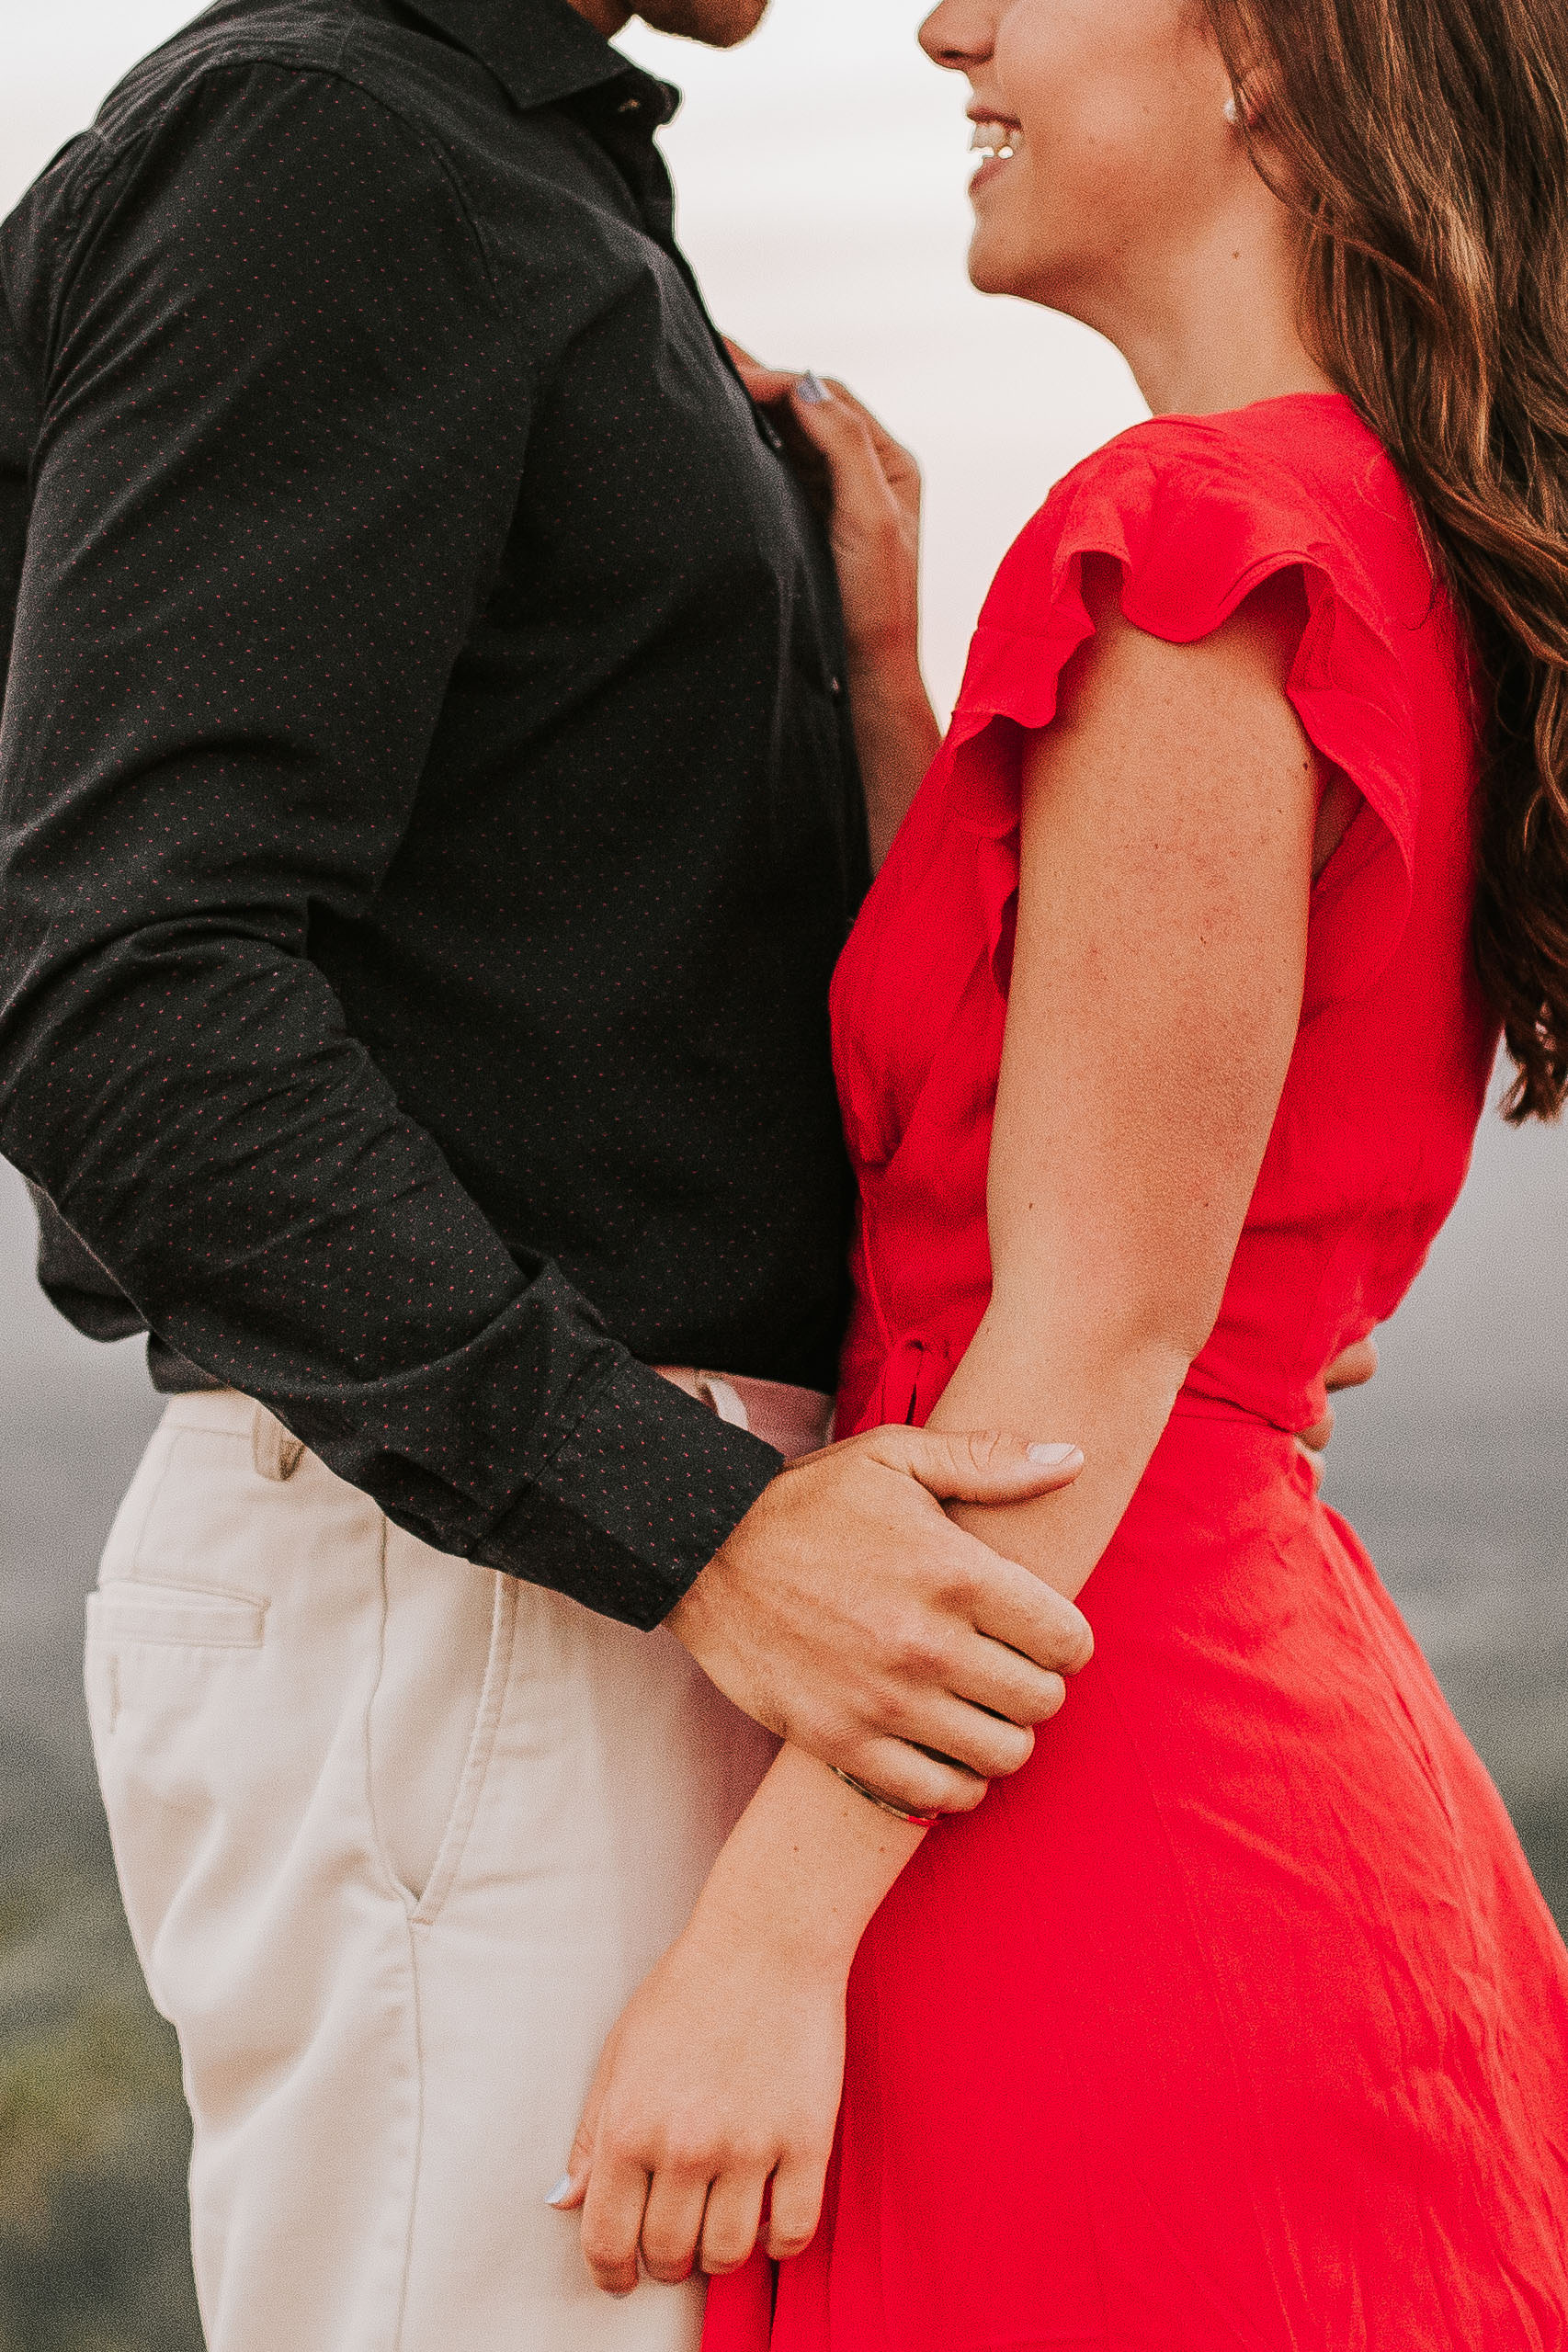 nicole-daacke-photography-rattlesnake-ridge-adventurous-engagement-session-hiking-seattle-washington-destinatino-elopement-intimate-wedding-photographer-22.jpg